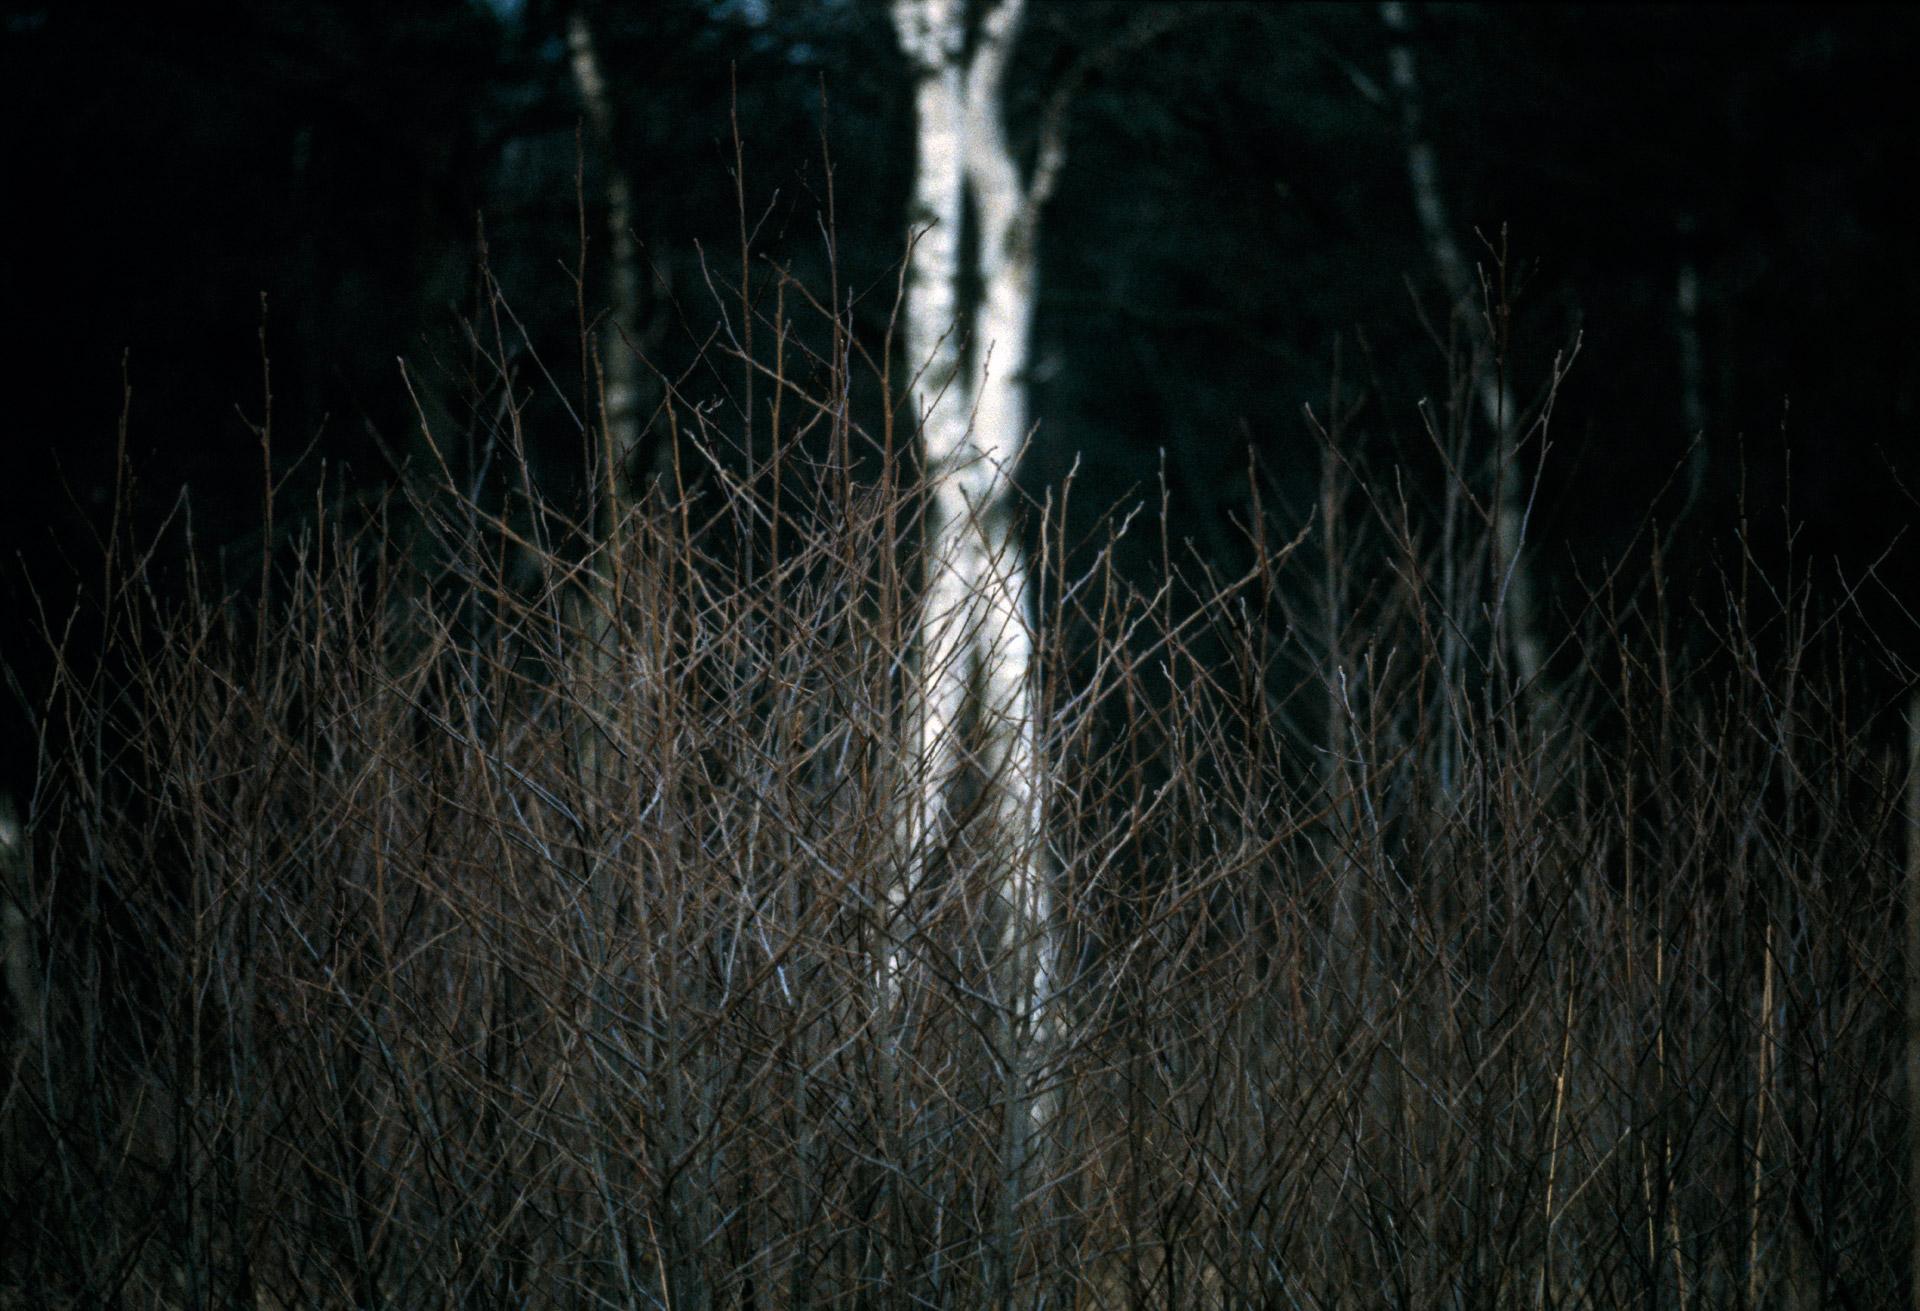 Two birch trees in Lyngby Åmose - Mølleåen